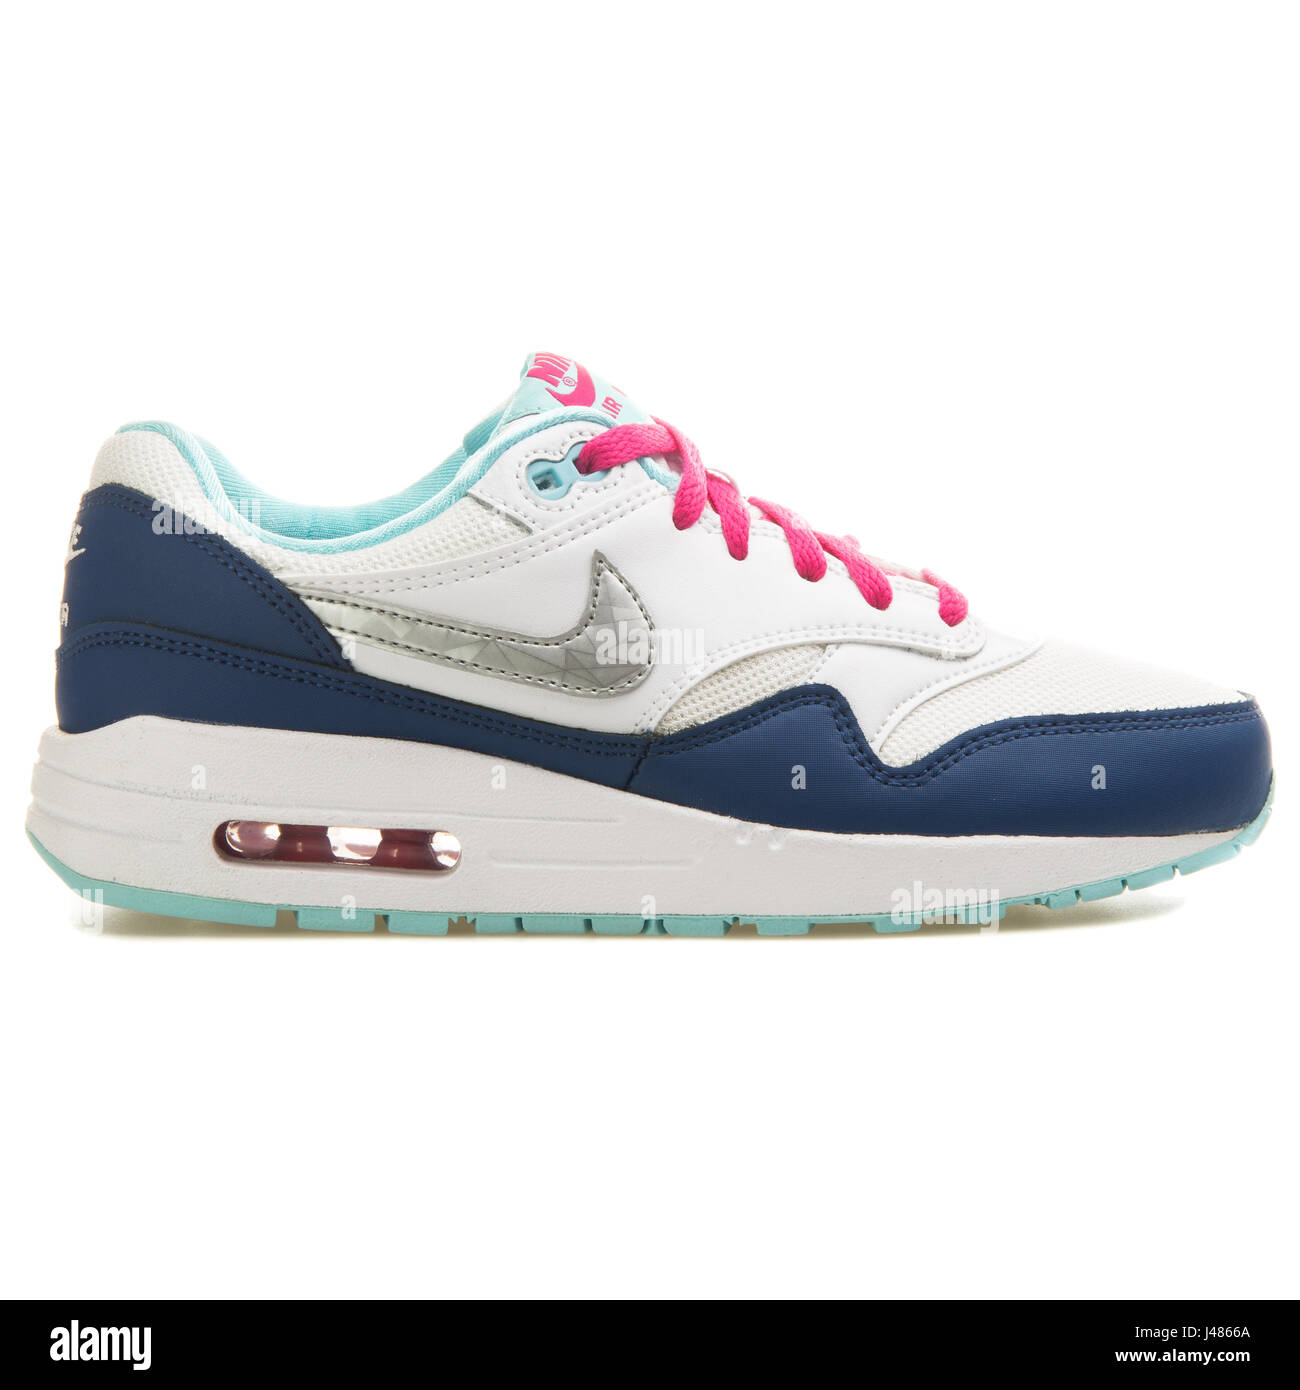 Nike Air Max 1 (GS) - 653653-100 - Stock Image